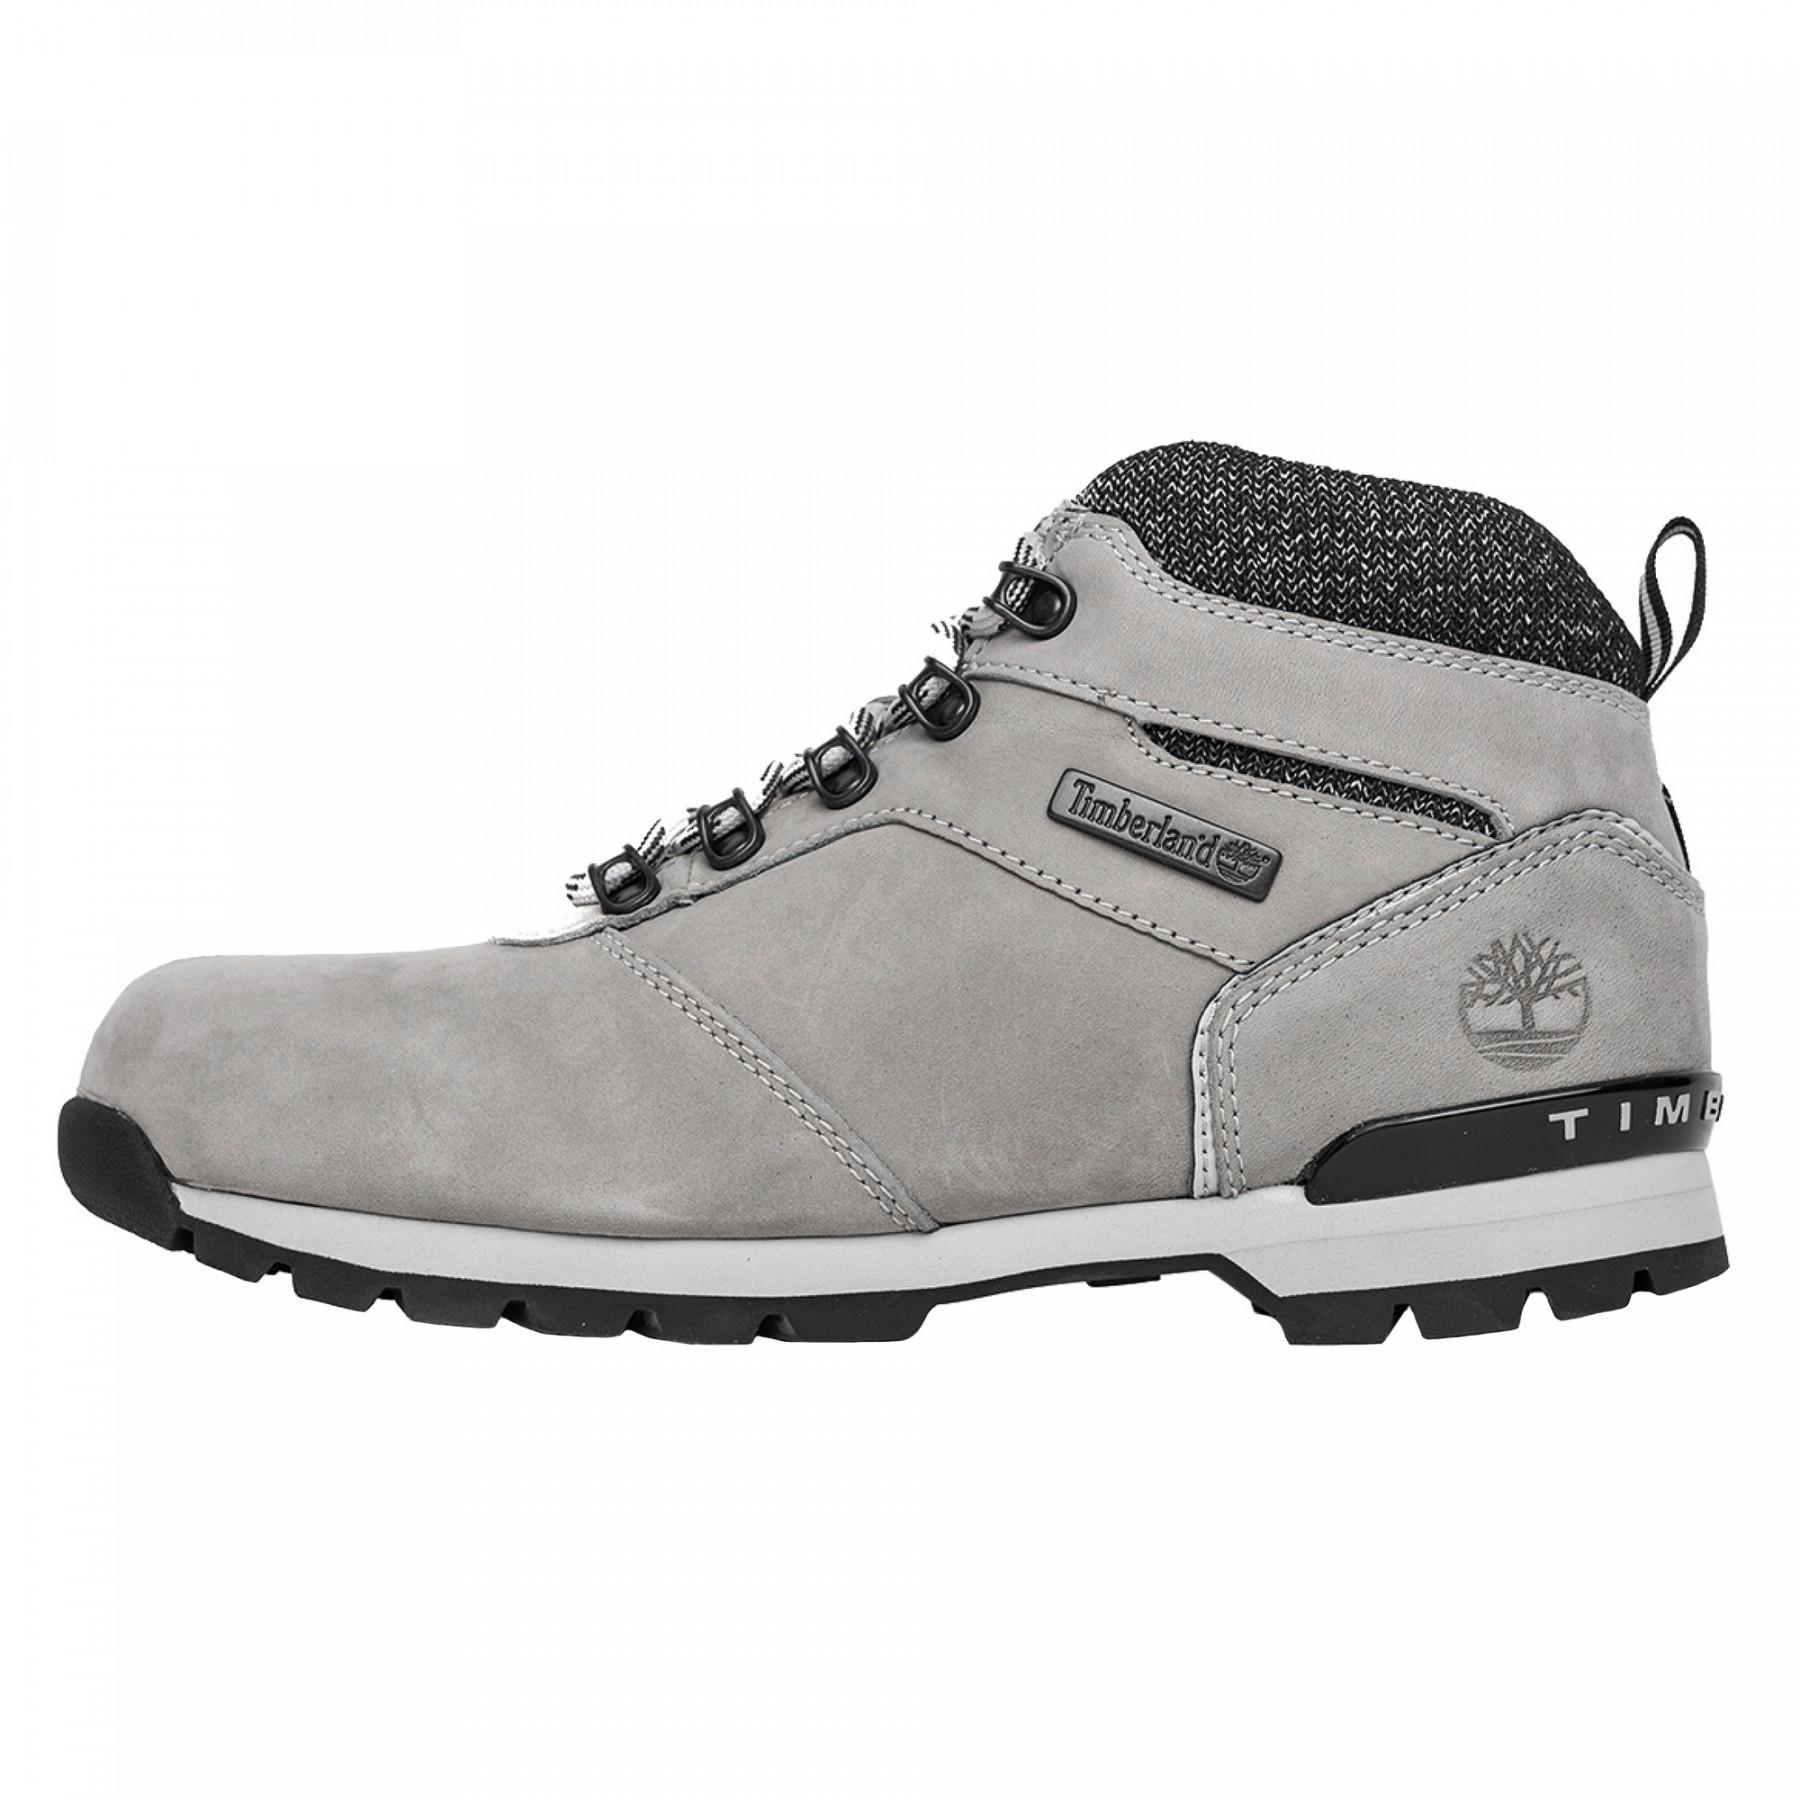 Chausure Pas Splitrock 2 Chaussures Timberland Af Gris Homme Cher FKc3luT1J